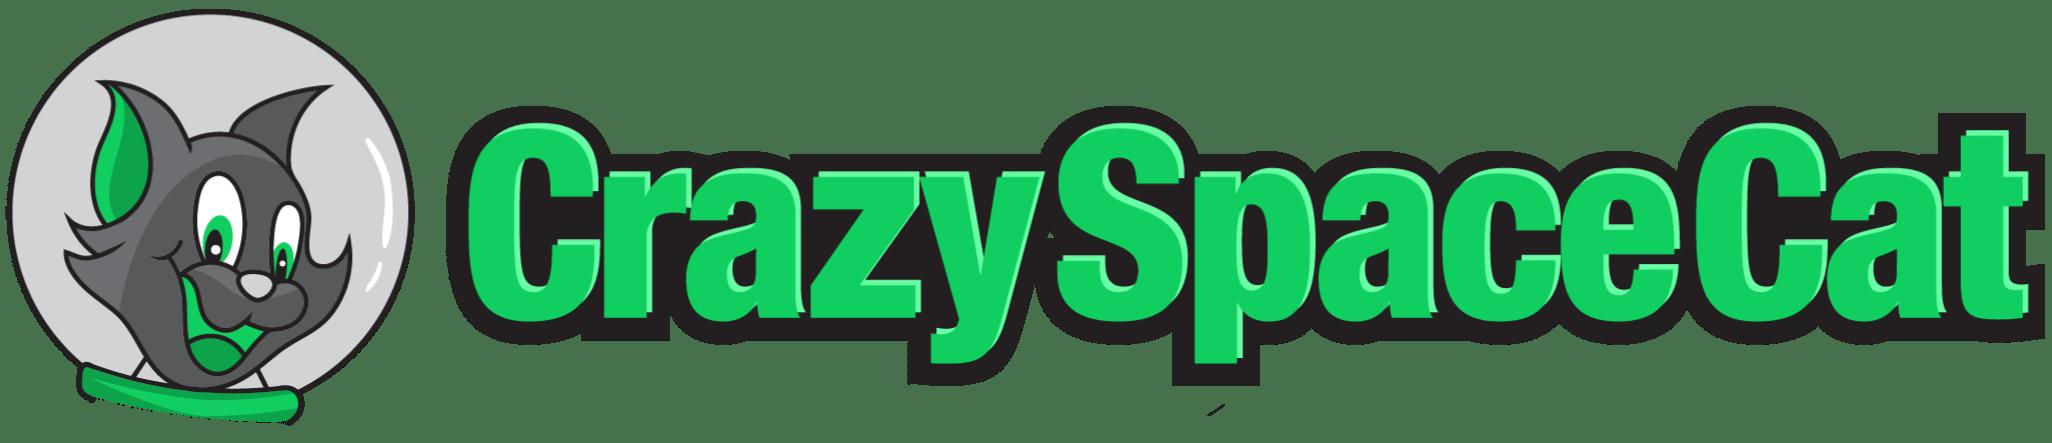 CrazySpaceCat-Head-Logo-min